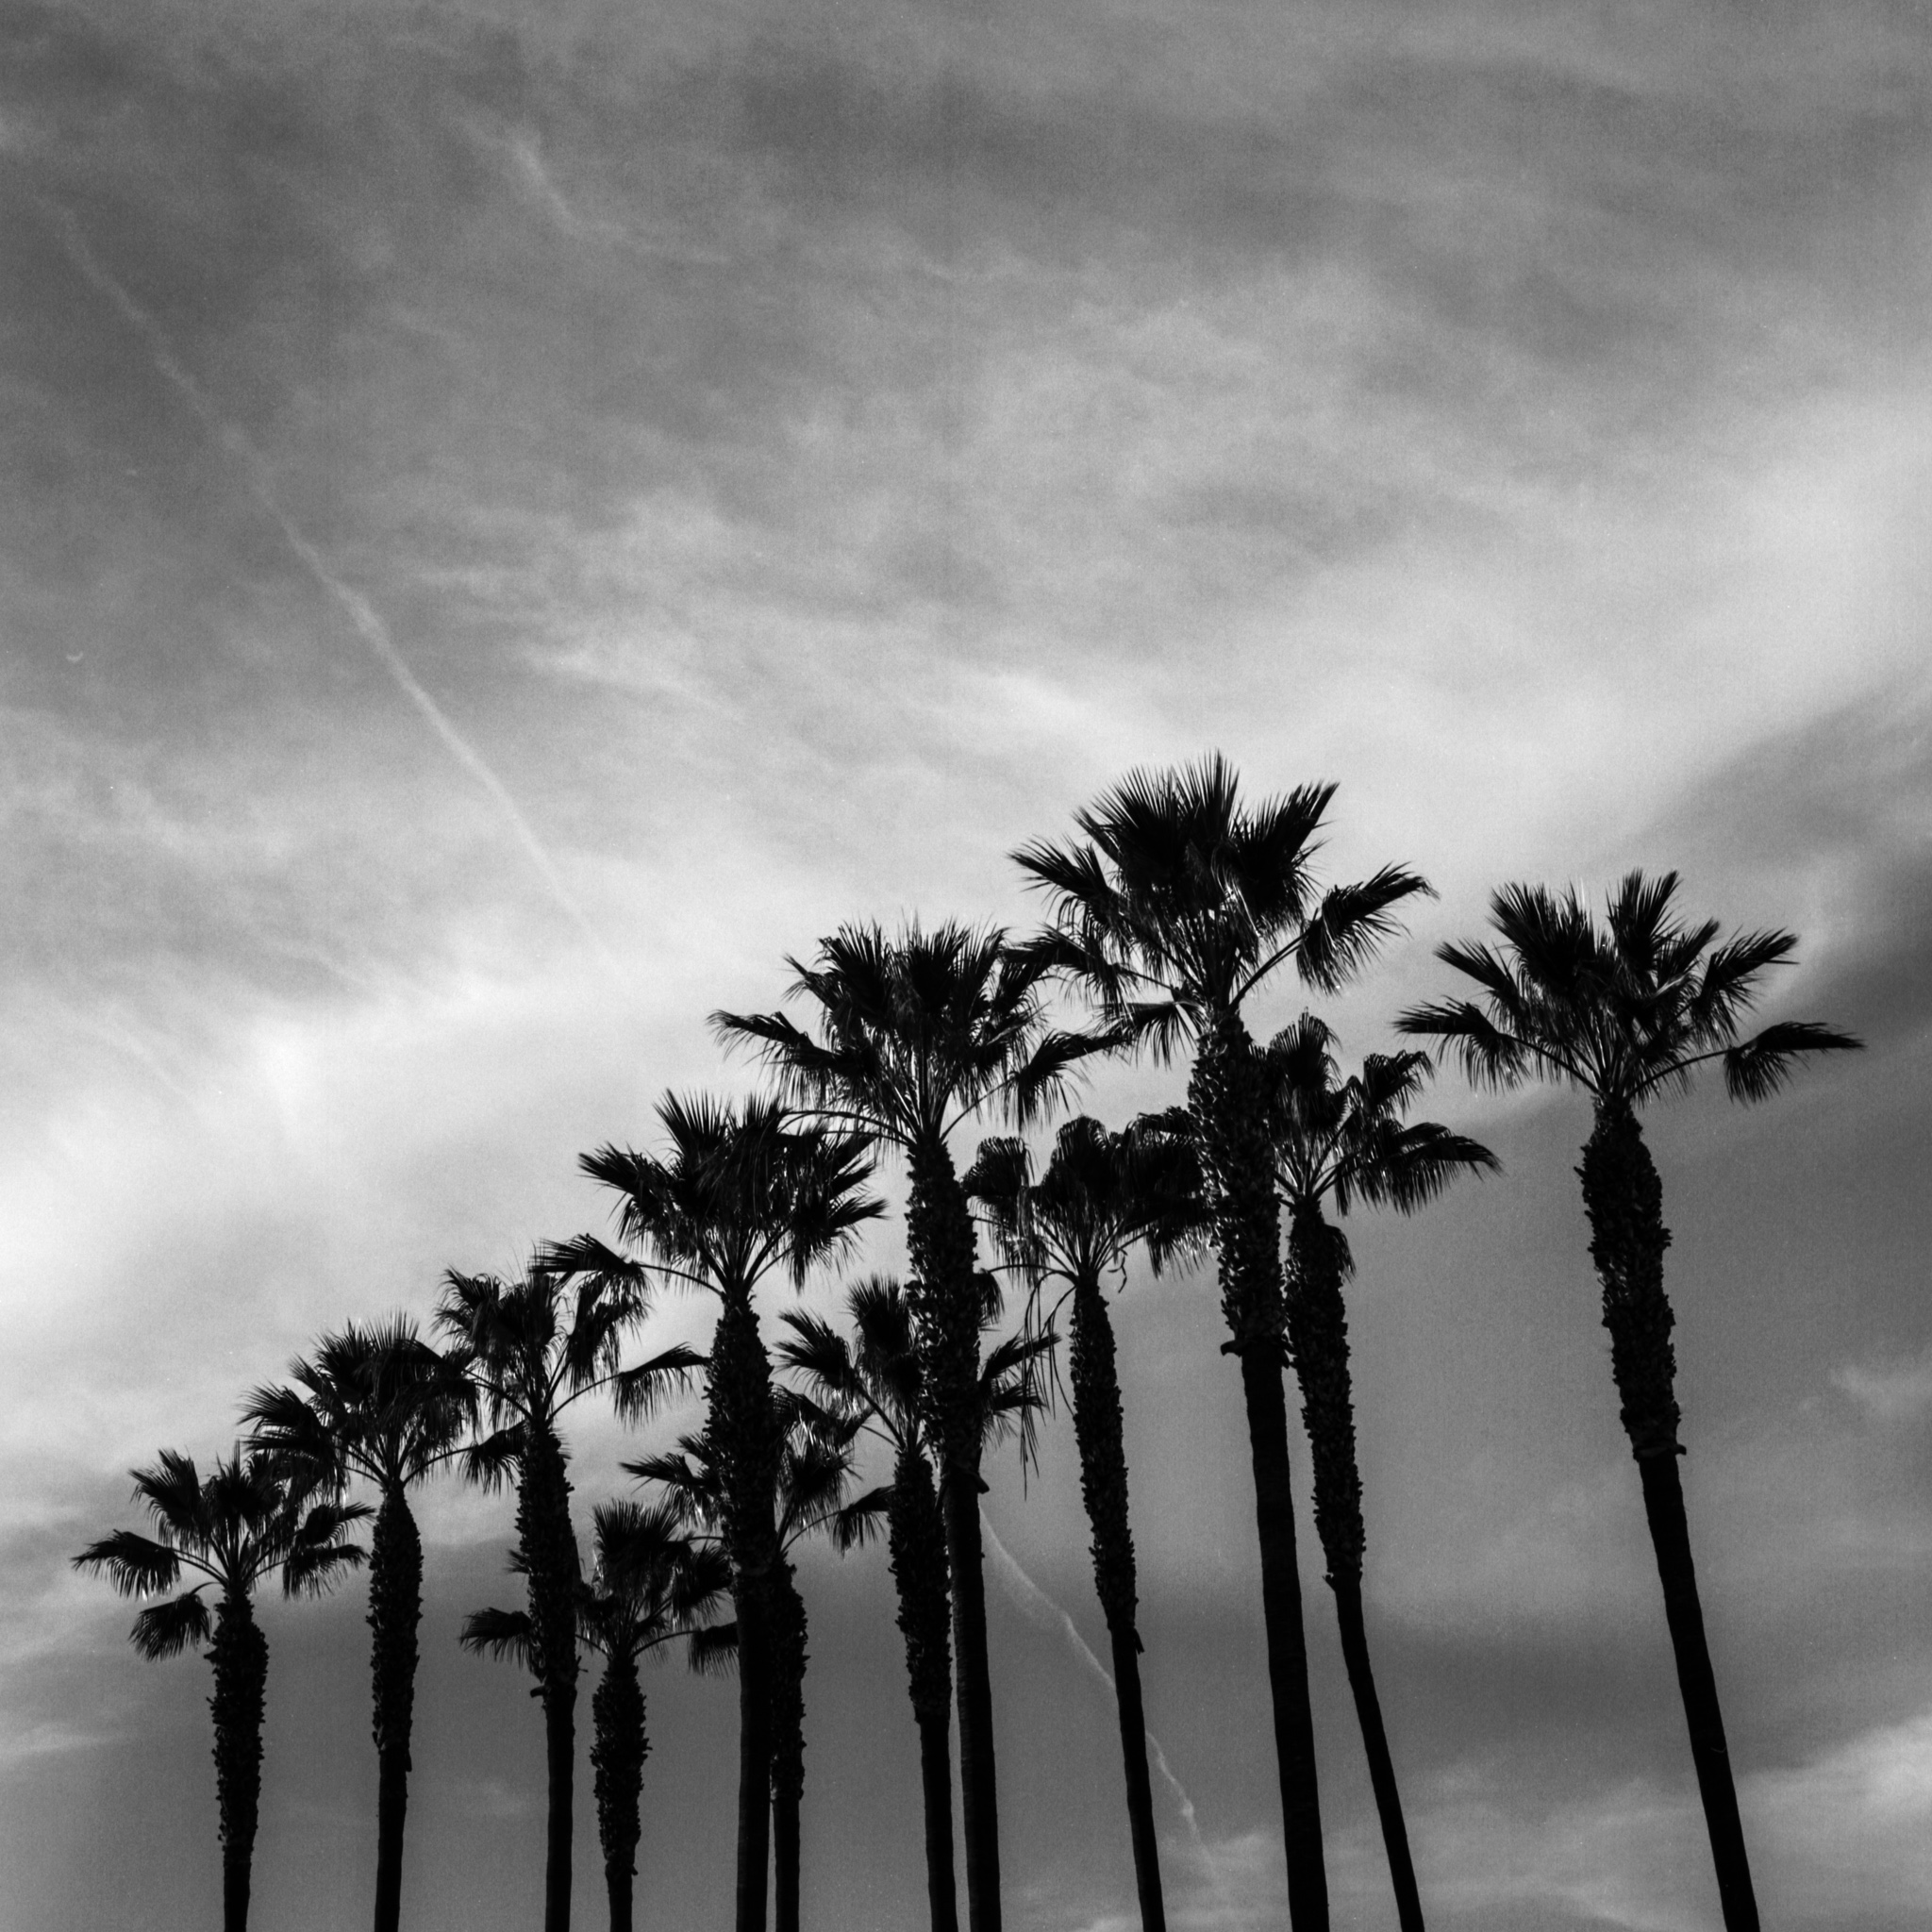 Goodbye LA (another ode de Ed Ruscha?), Los Angeles, CA, 2016